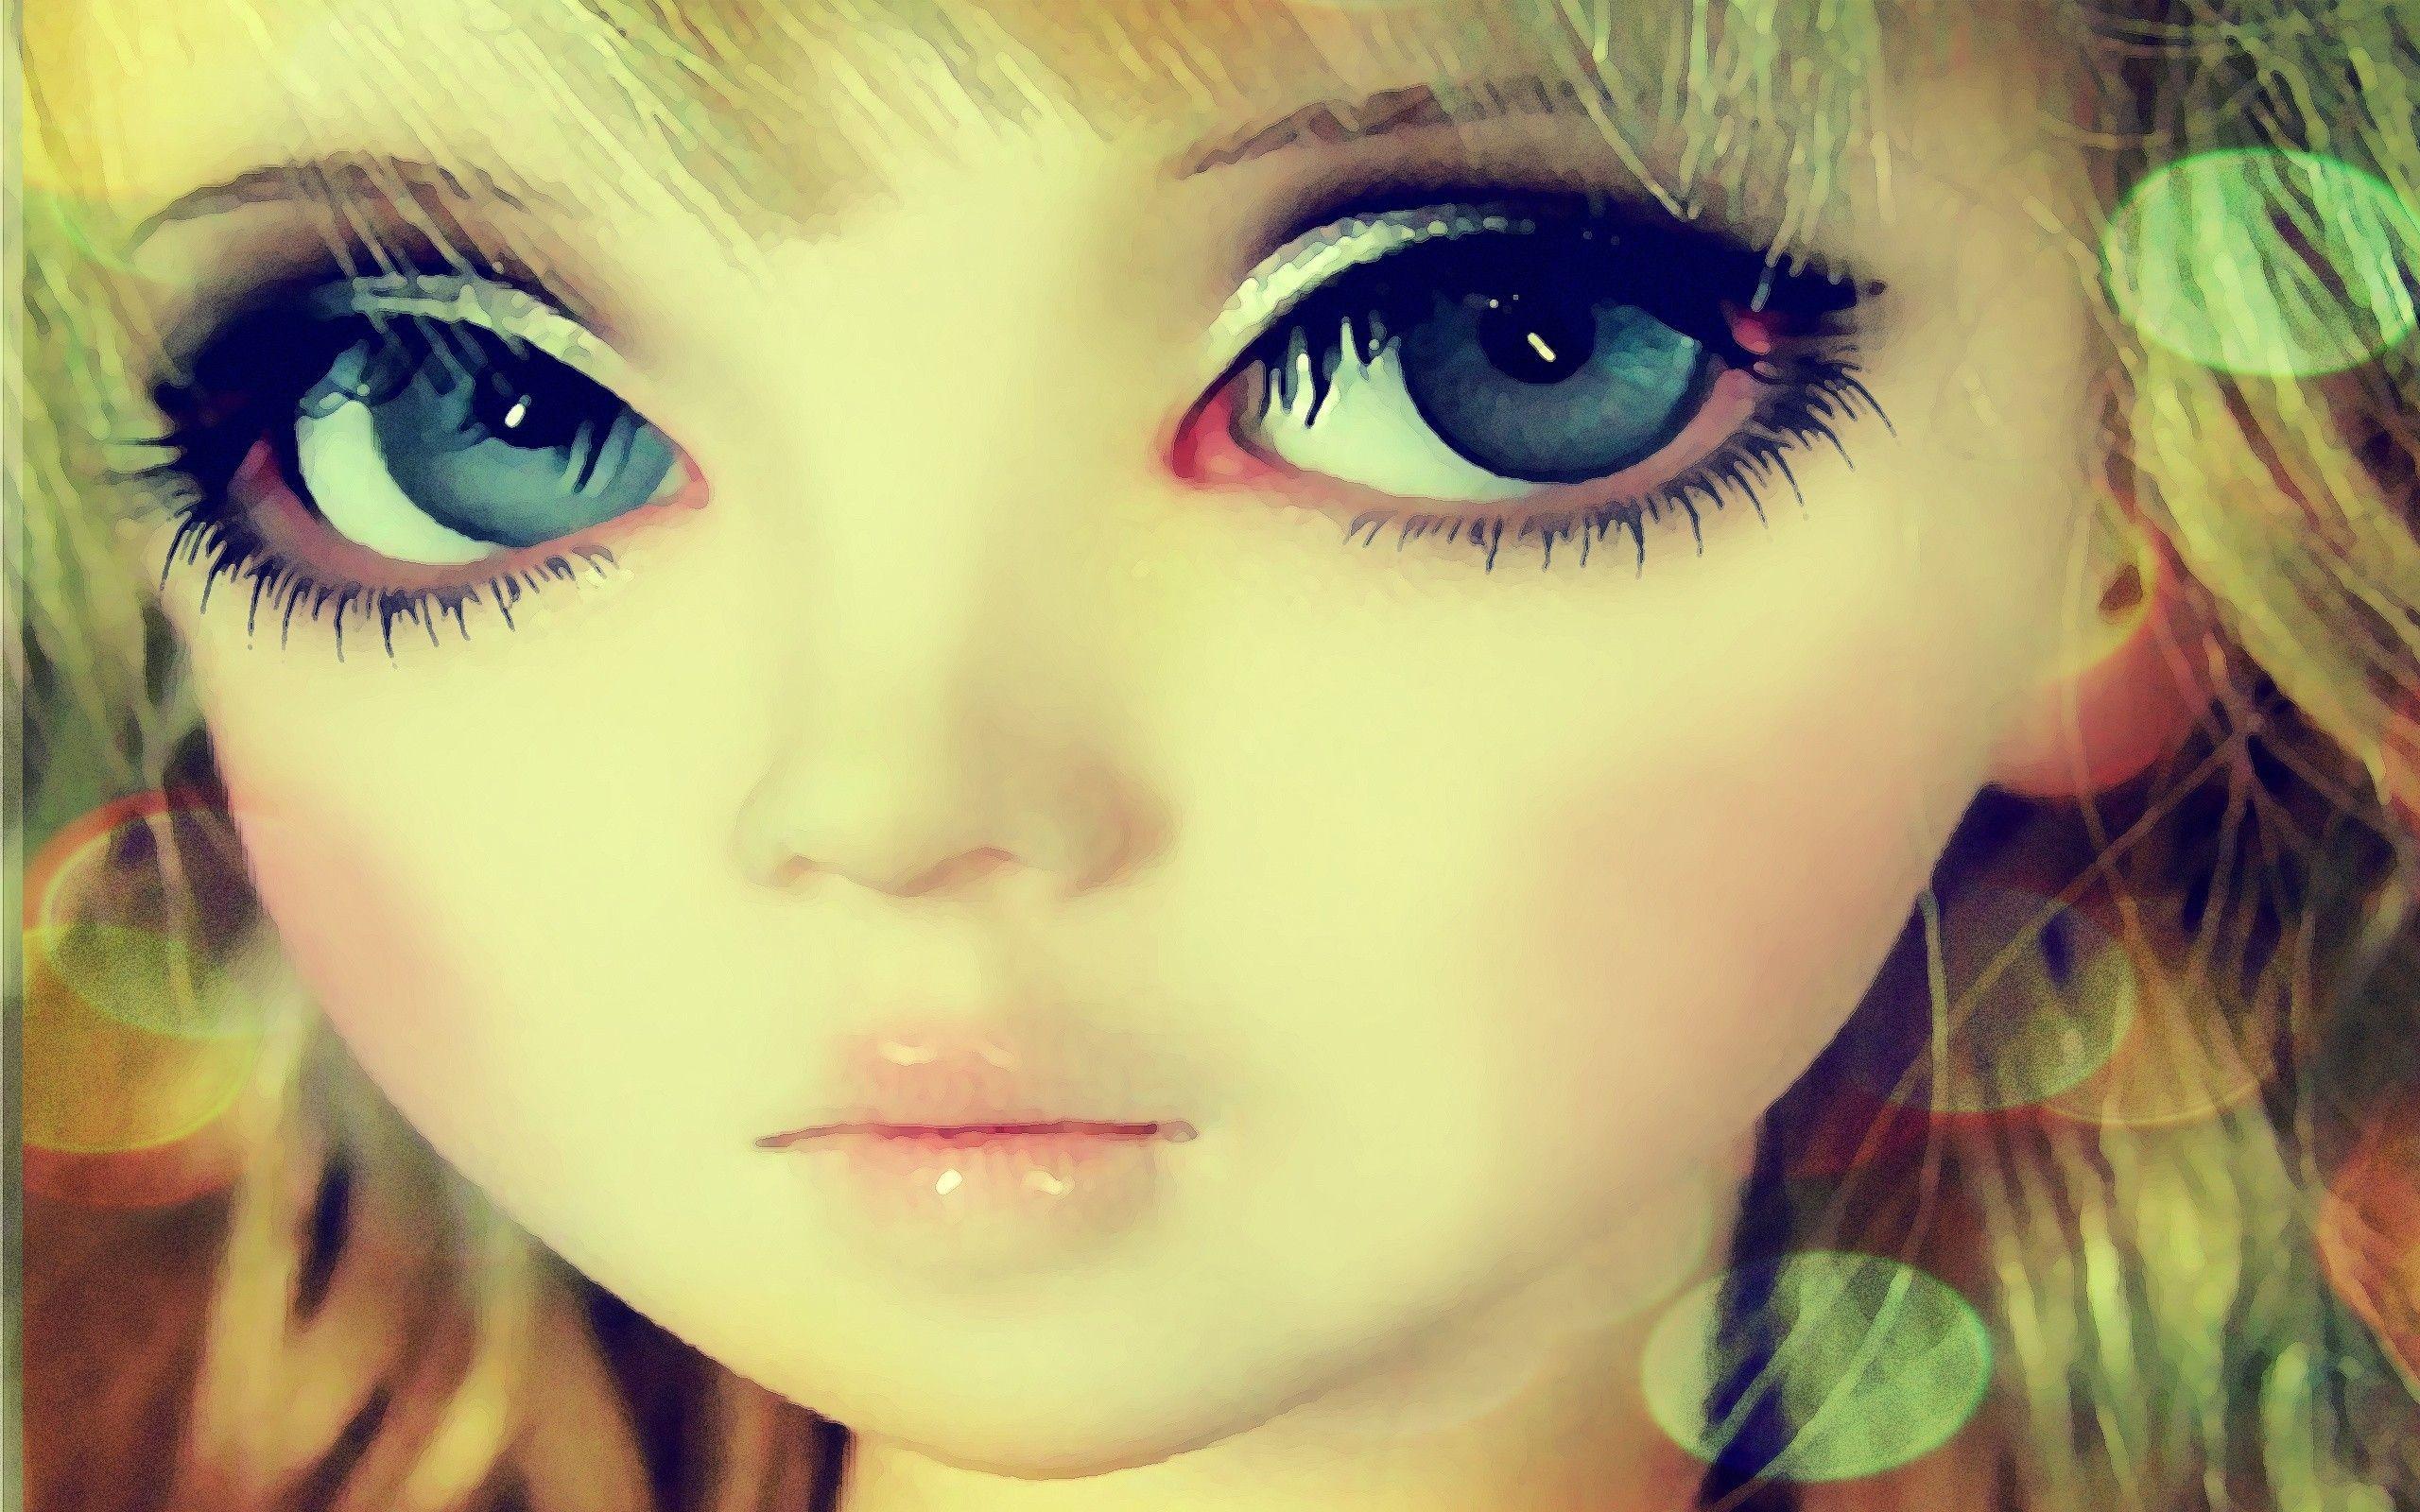 Res: 2560x1600, Cute Dolls | Dolls Cute Face of Doll – HD Wallpapers Desktop Wallpapers 3D .